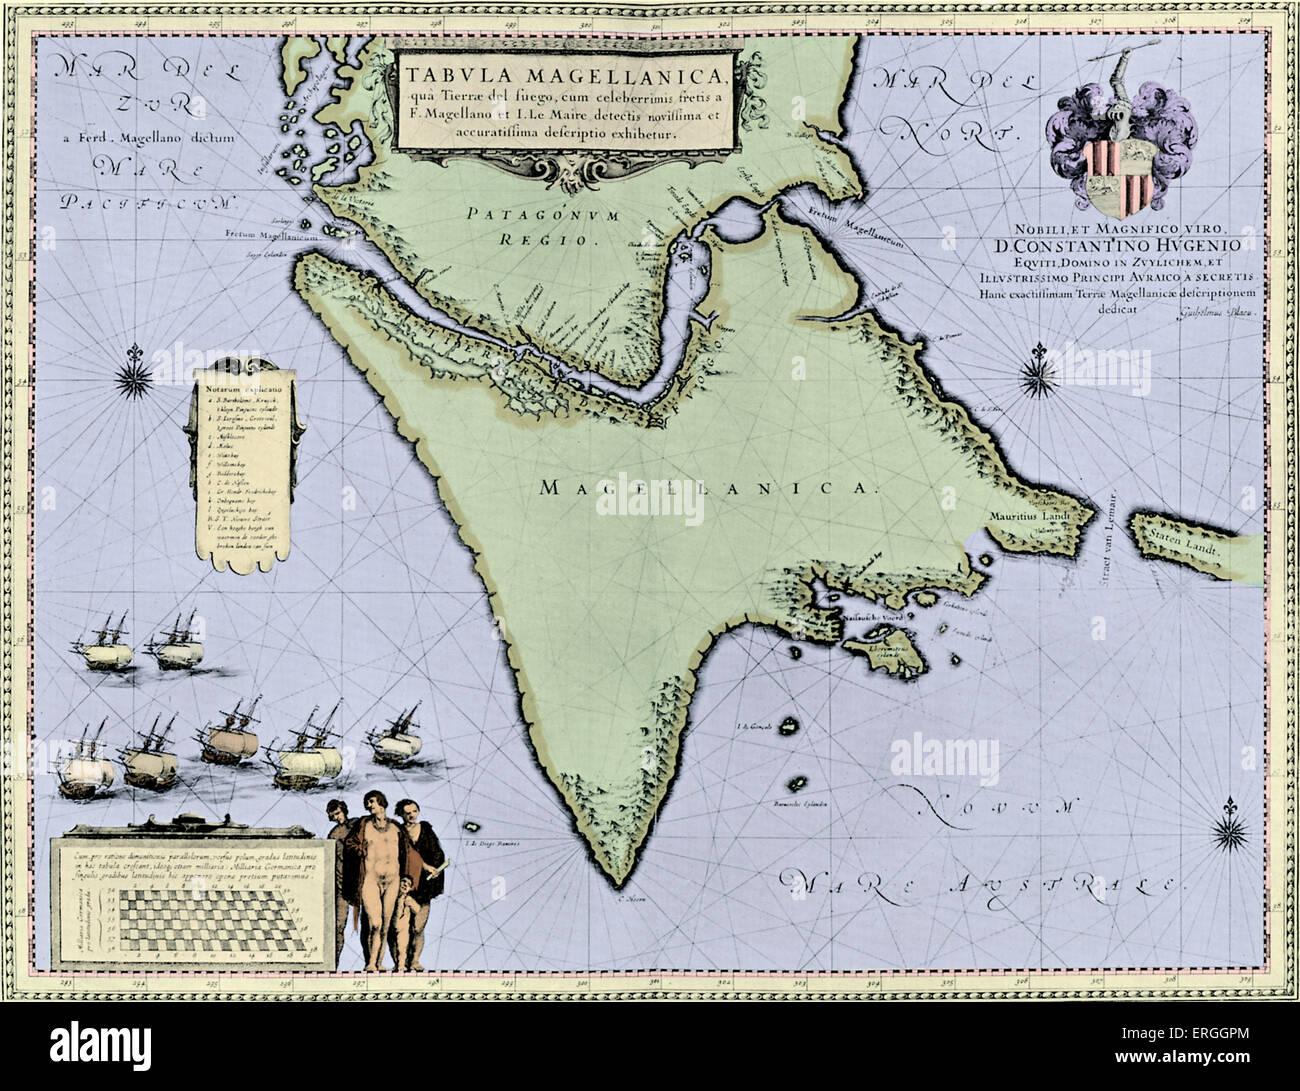 Strait of Magellan and Tierra del Fuego - map published in W.J Blaeu and J. Blaeu 's 'Nieuwe Atlas', - Stock Image